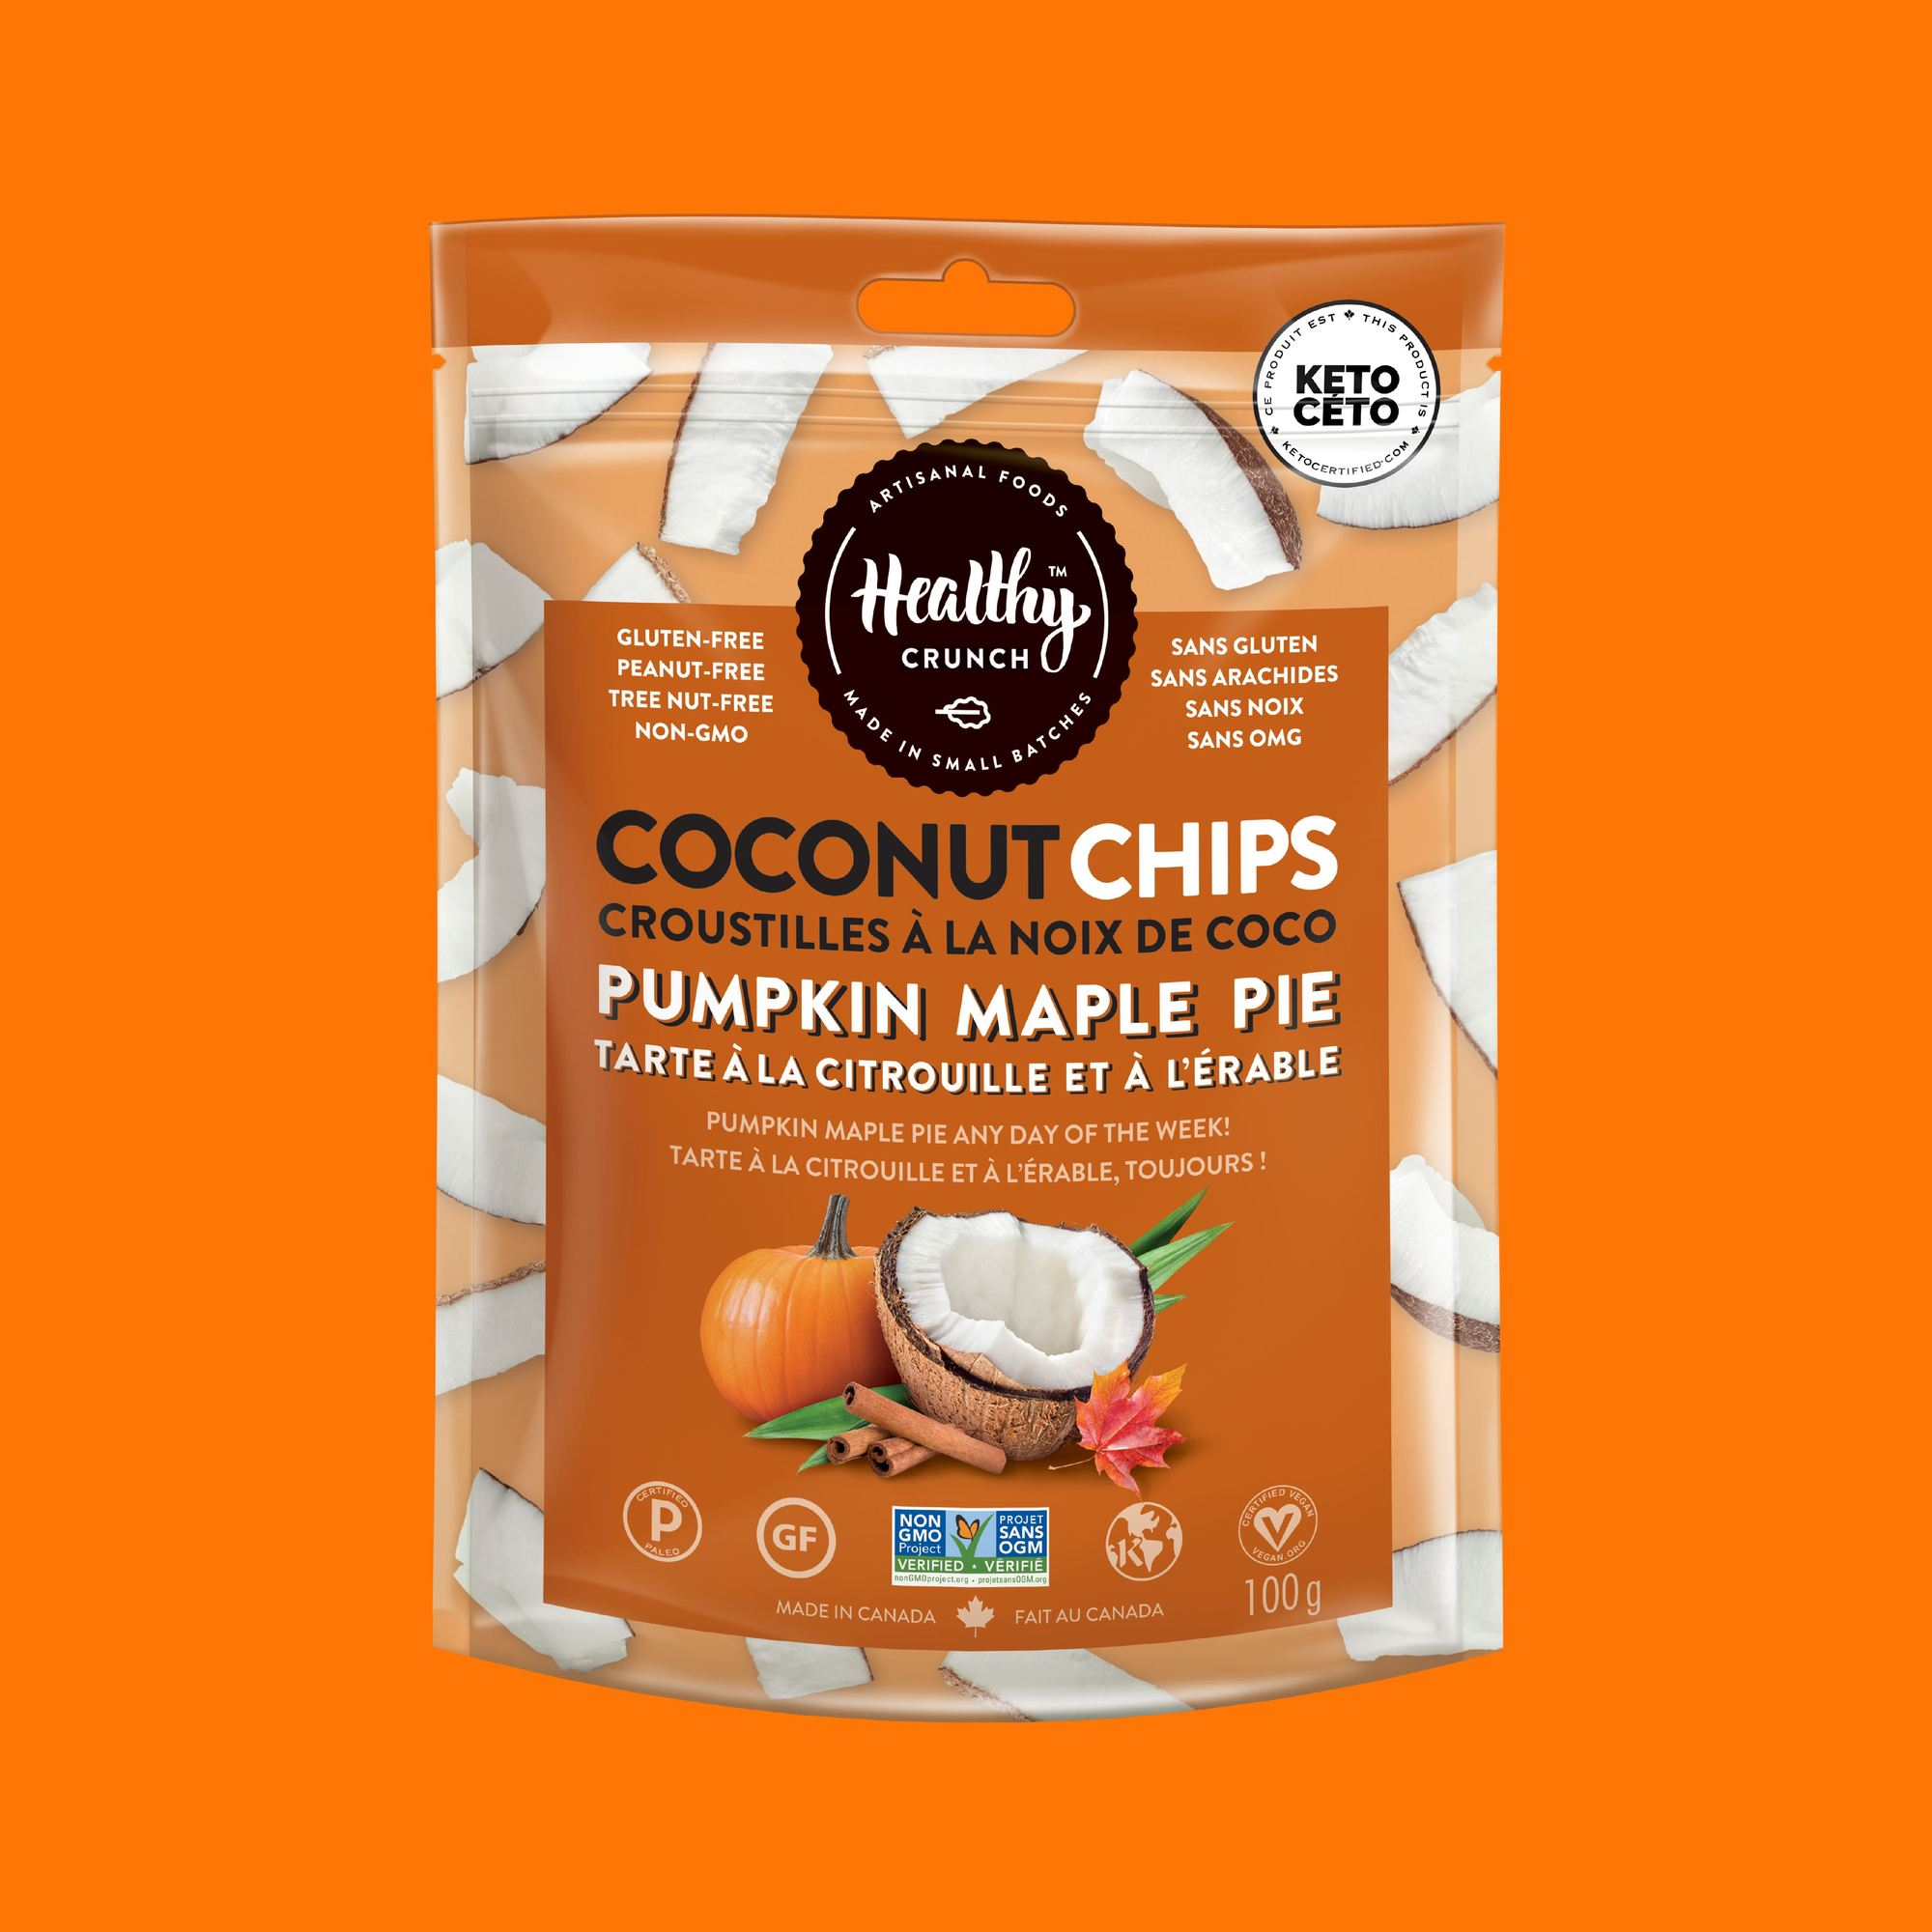 Pumpkin Maple Pie Coconut Chips